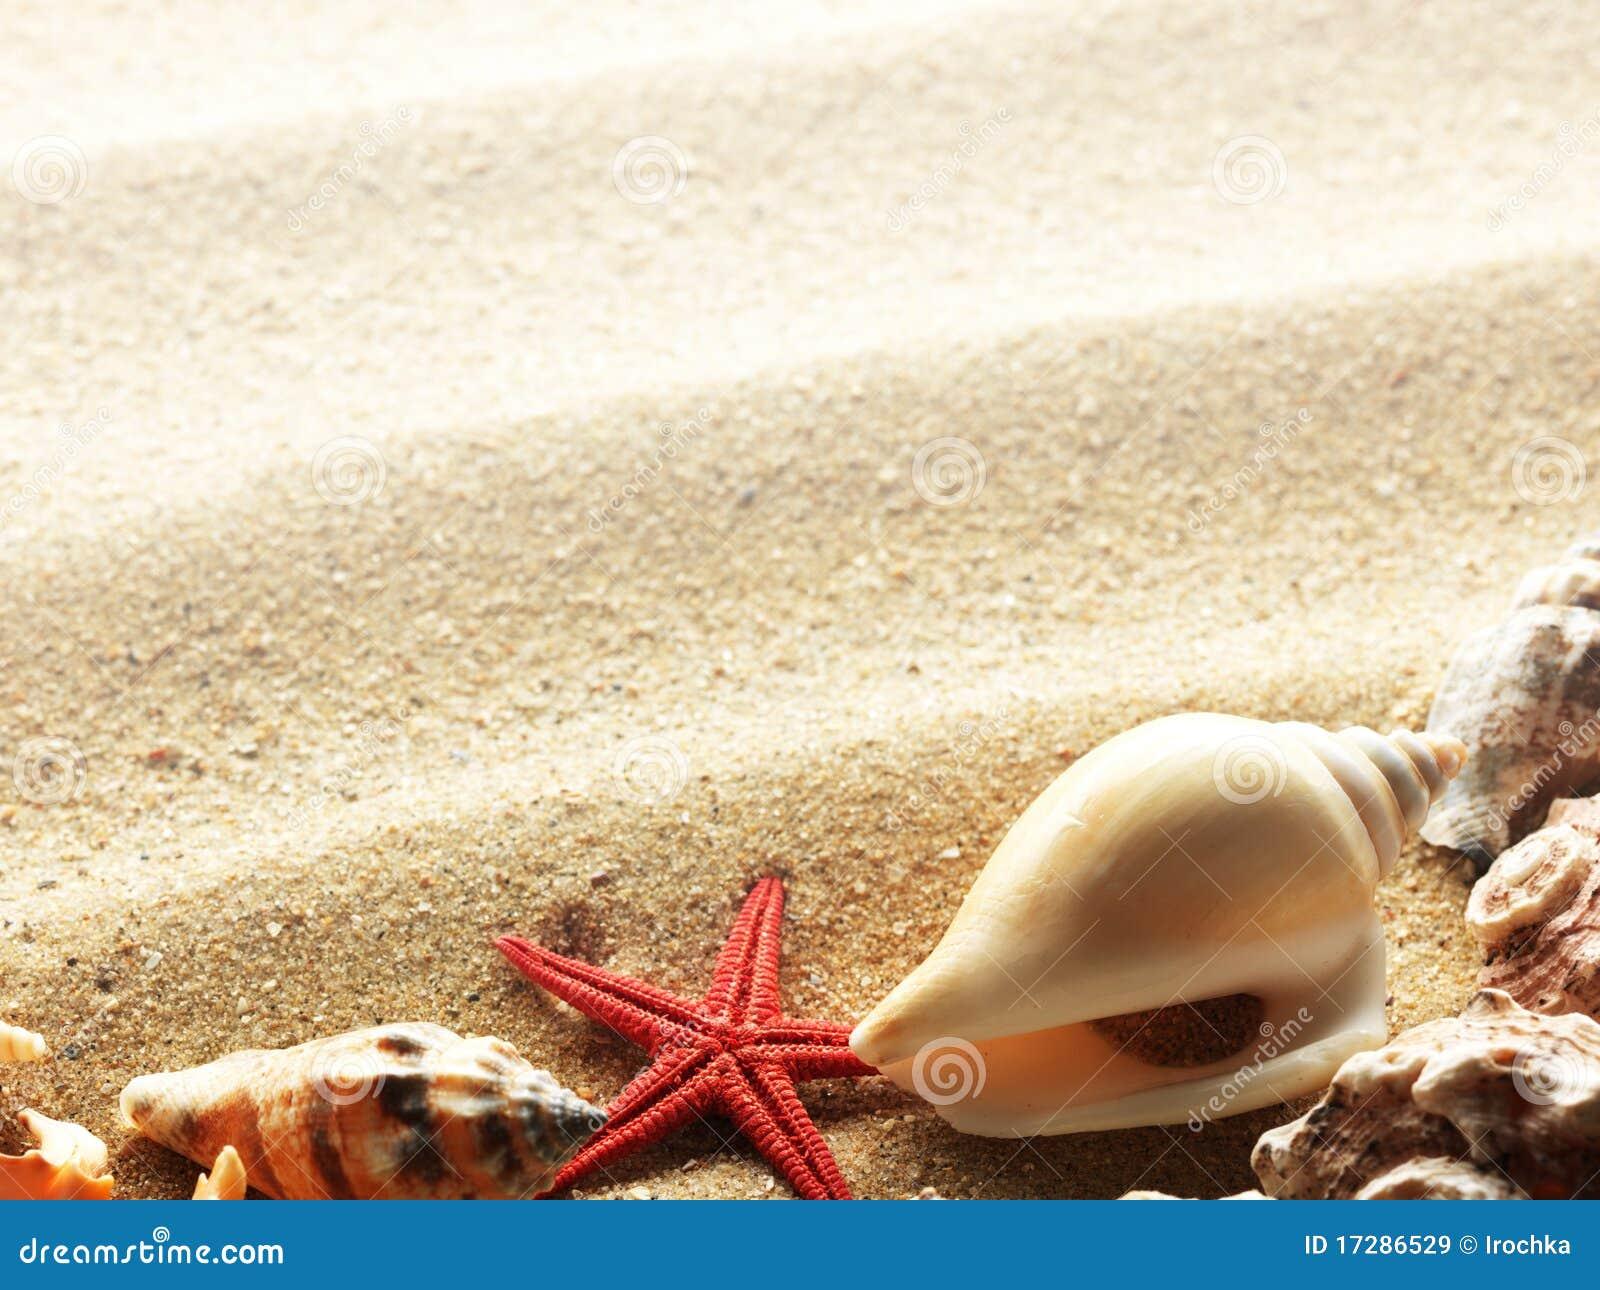 Sea Shells on Sand Border